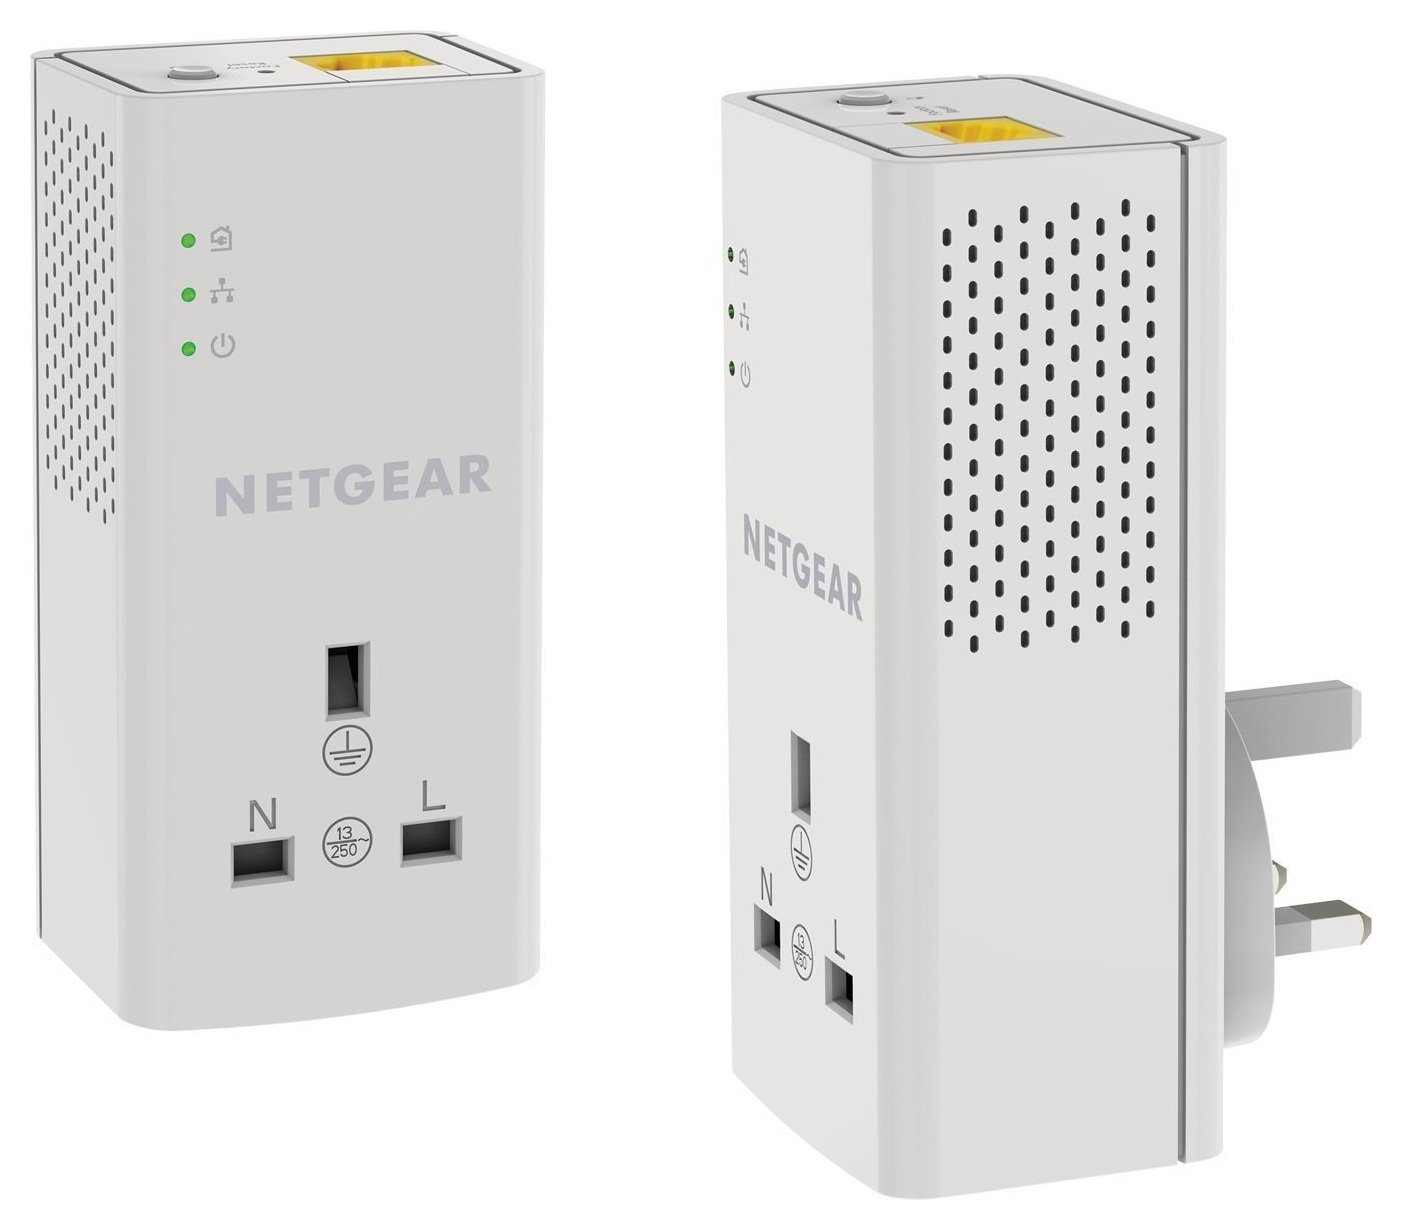 Netgear 1000Mbps Powerline Kit and Pass Through